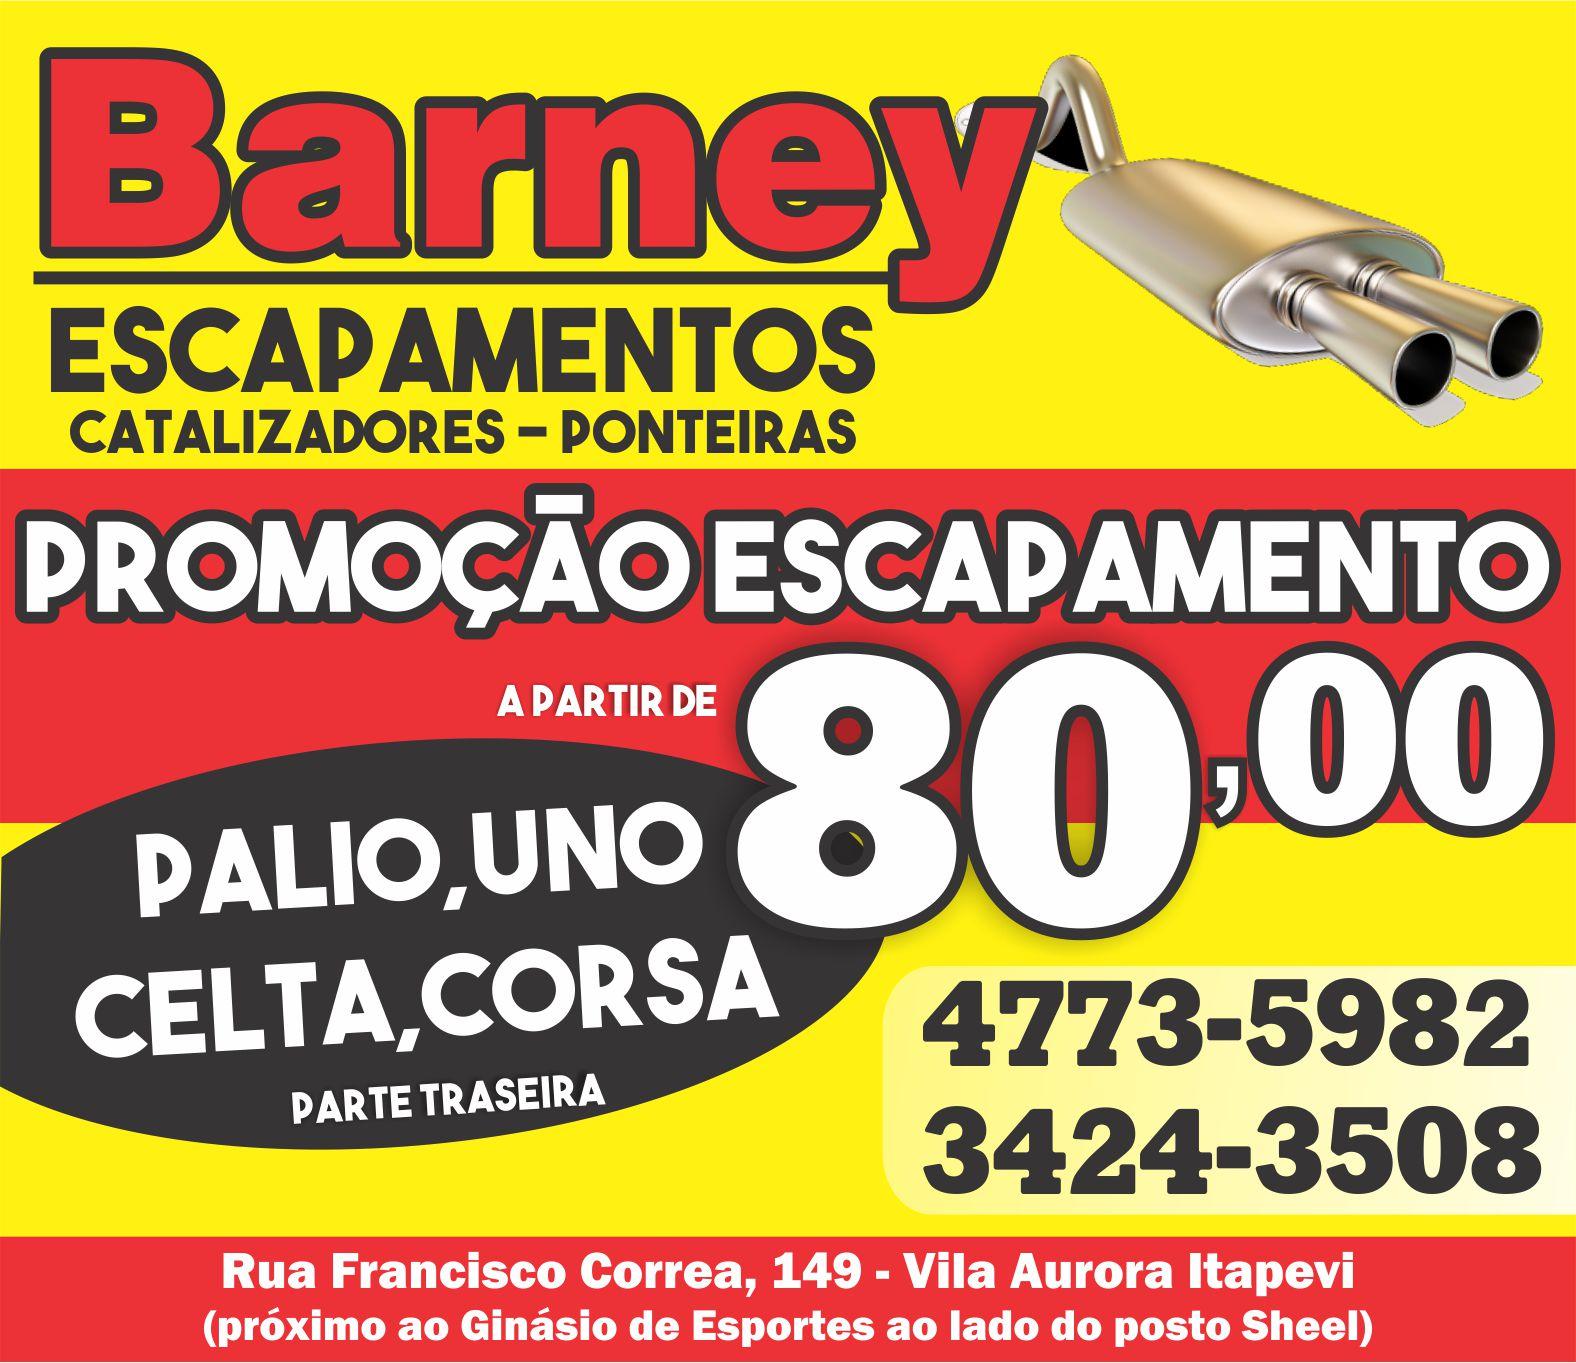 Barney tapevi